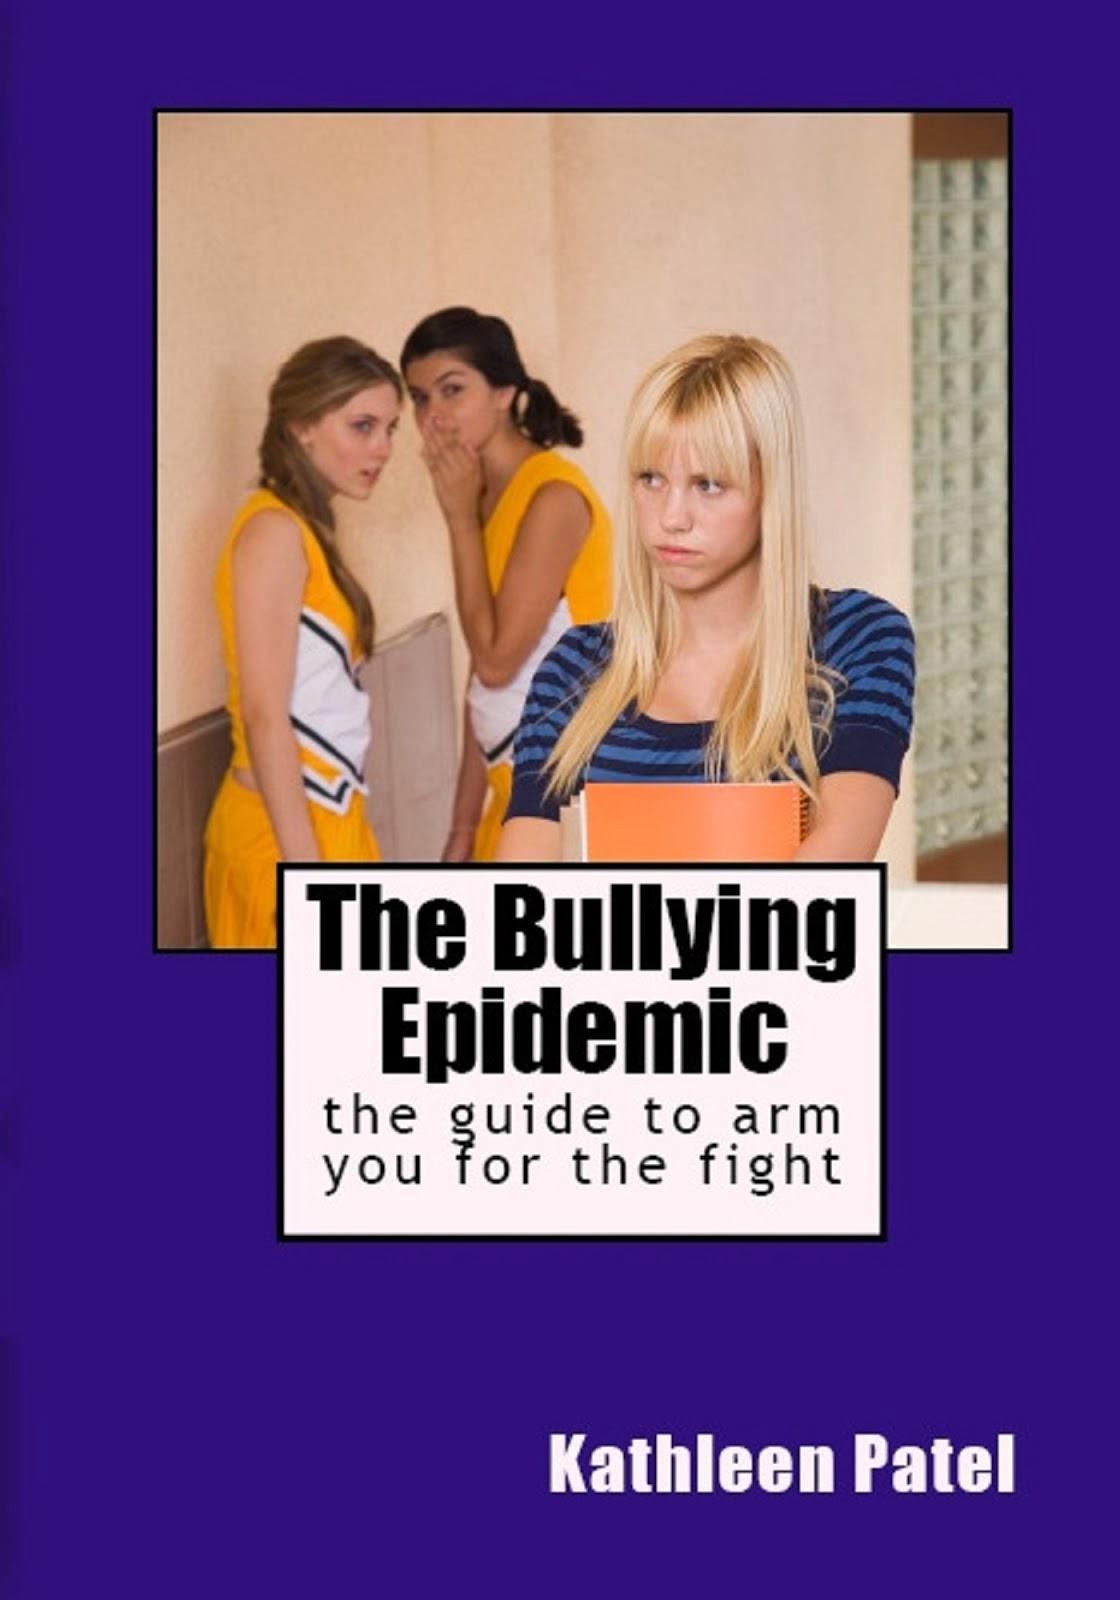 The Bullying Epidemic-